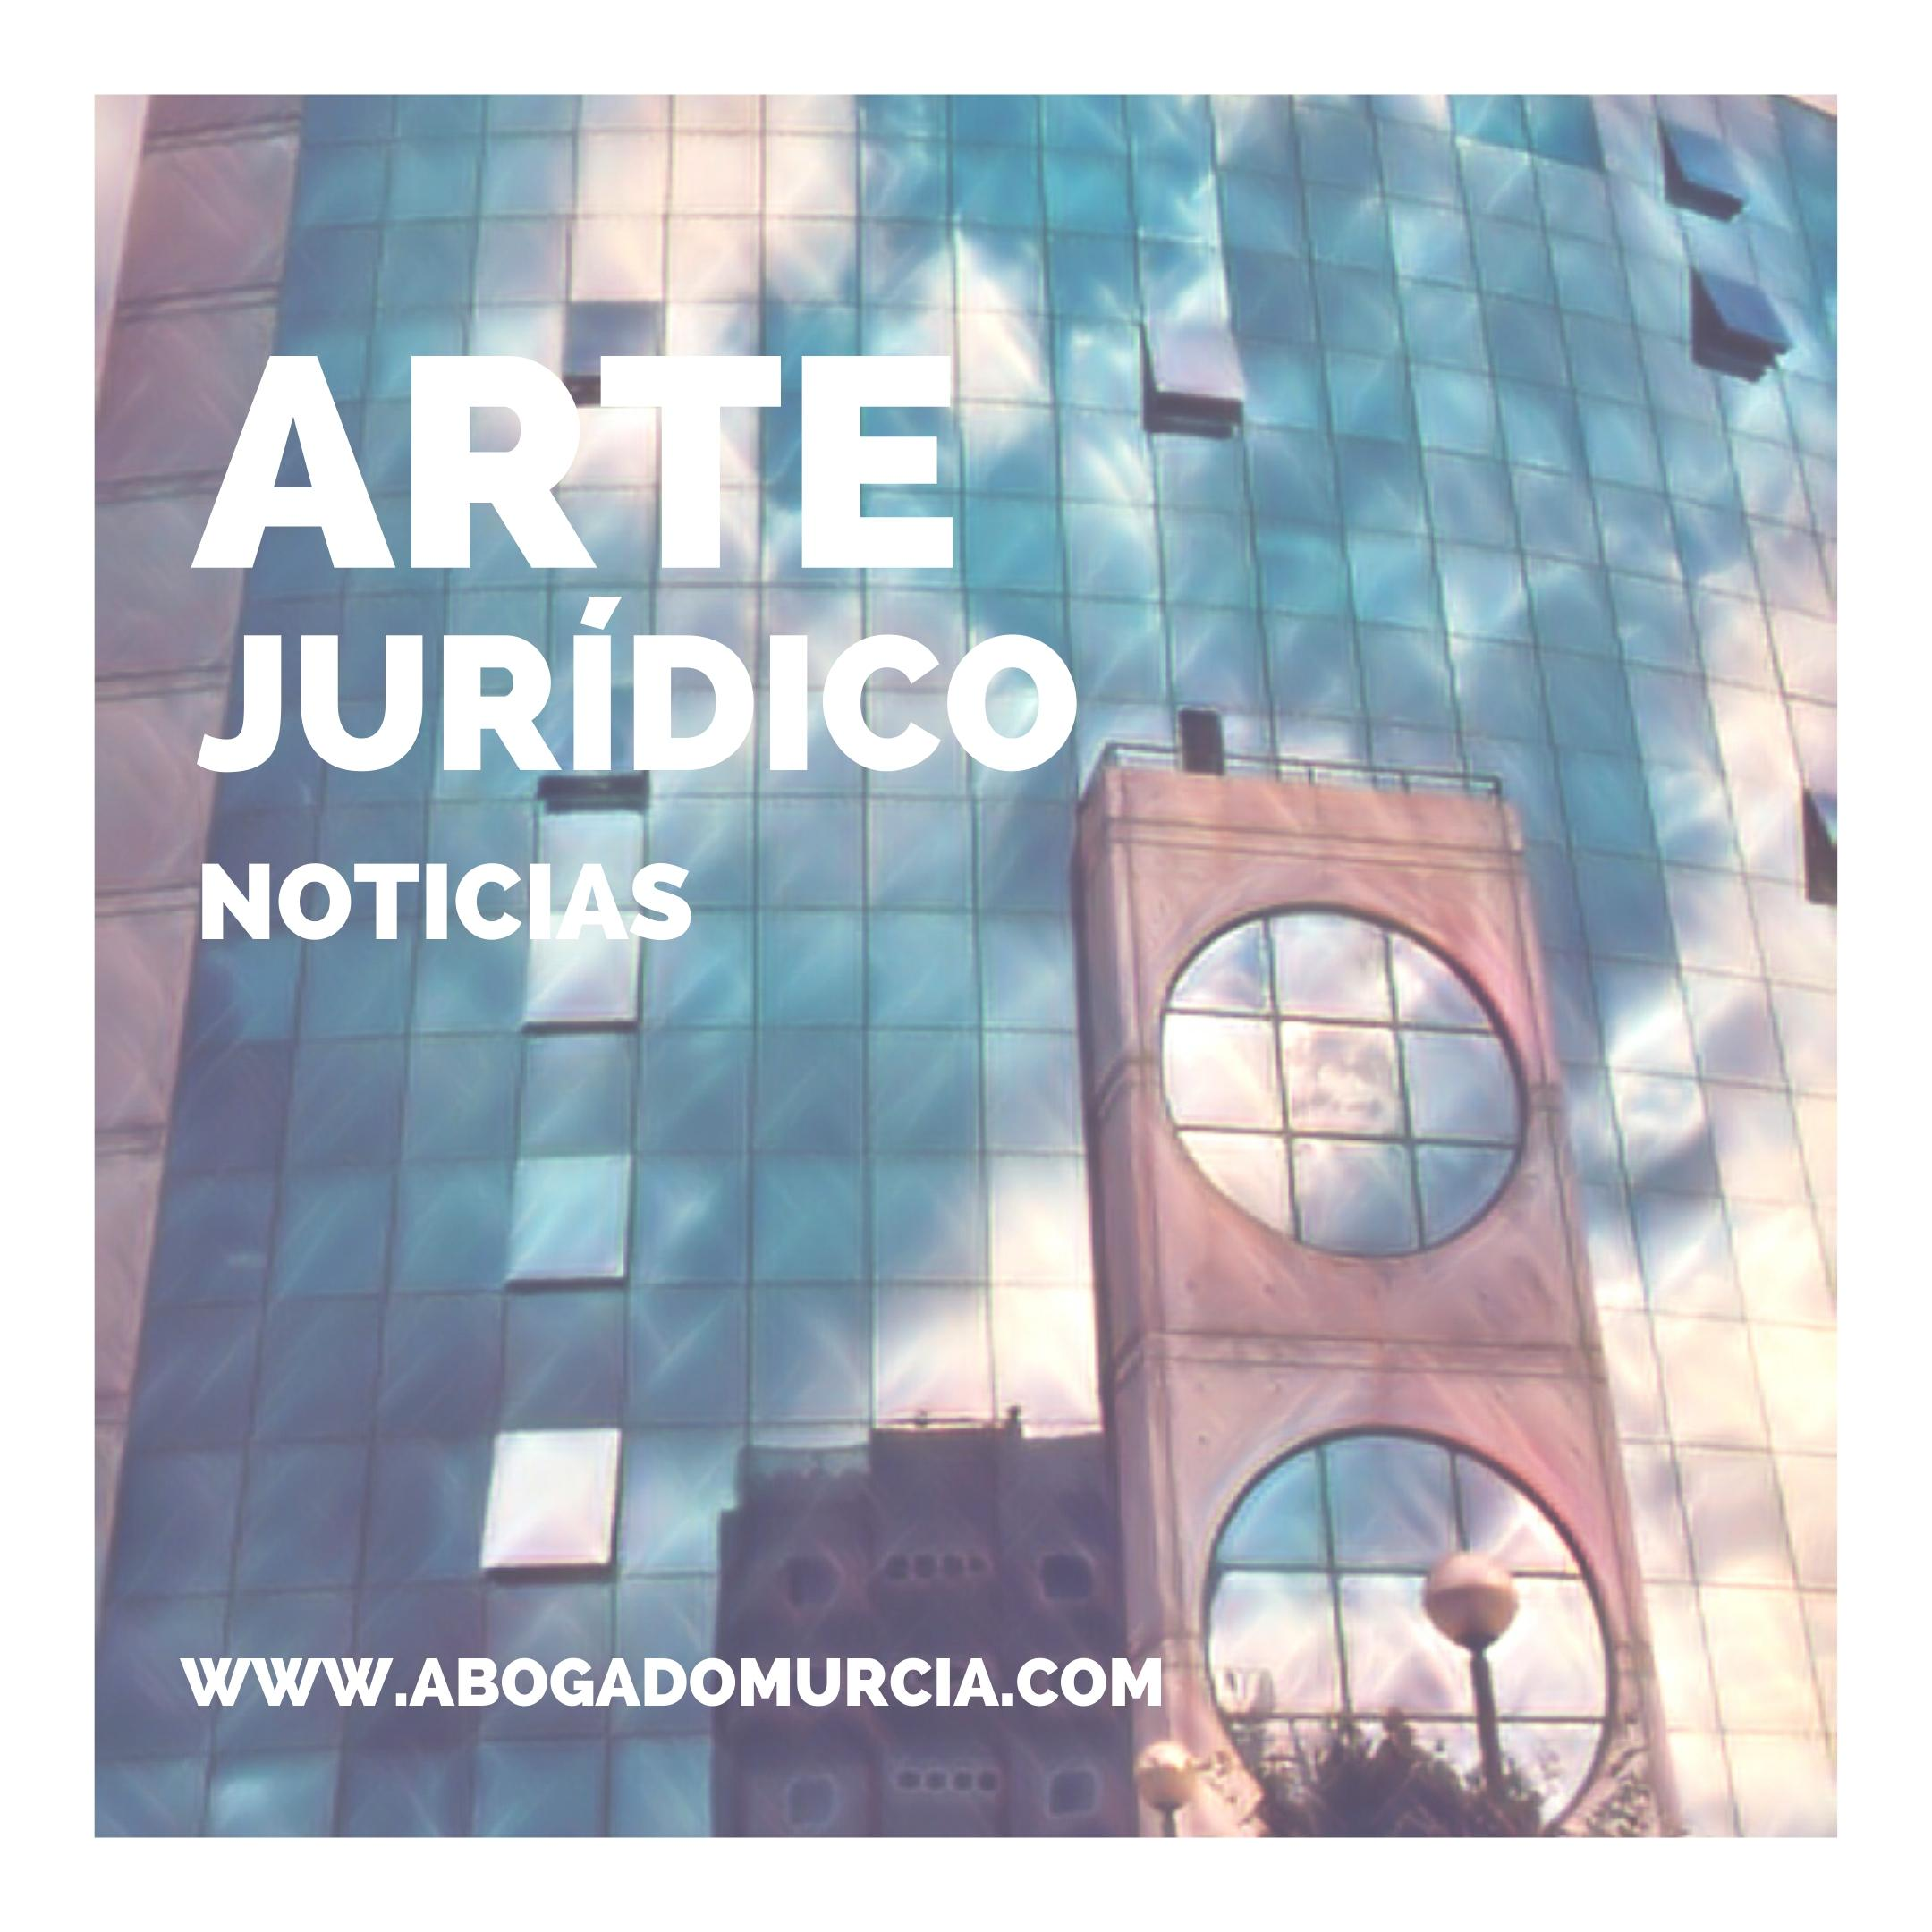 ARTE JURÍDICO. NOTICIAS JURÍDICAS.